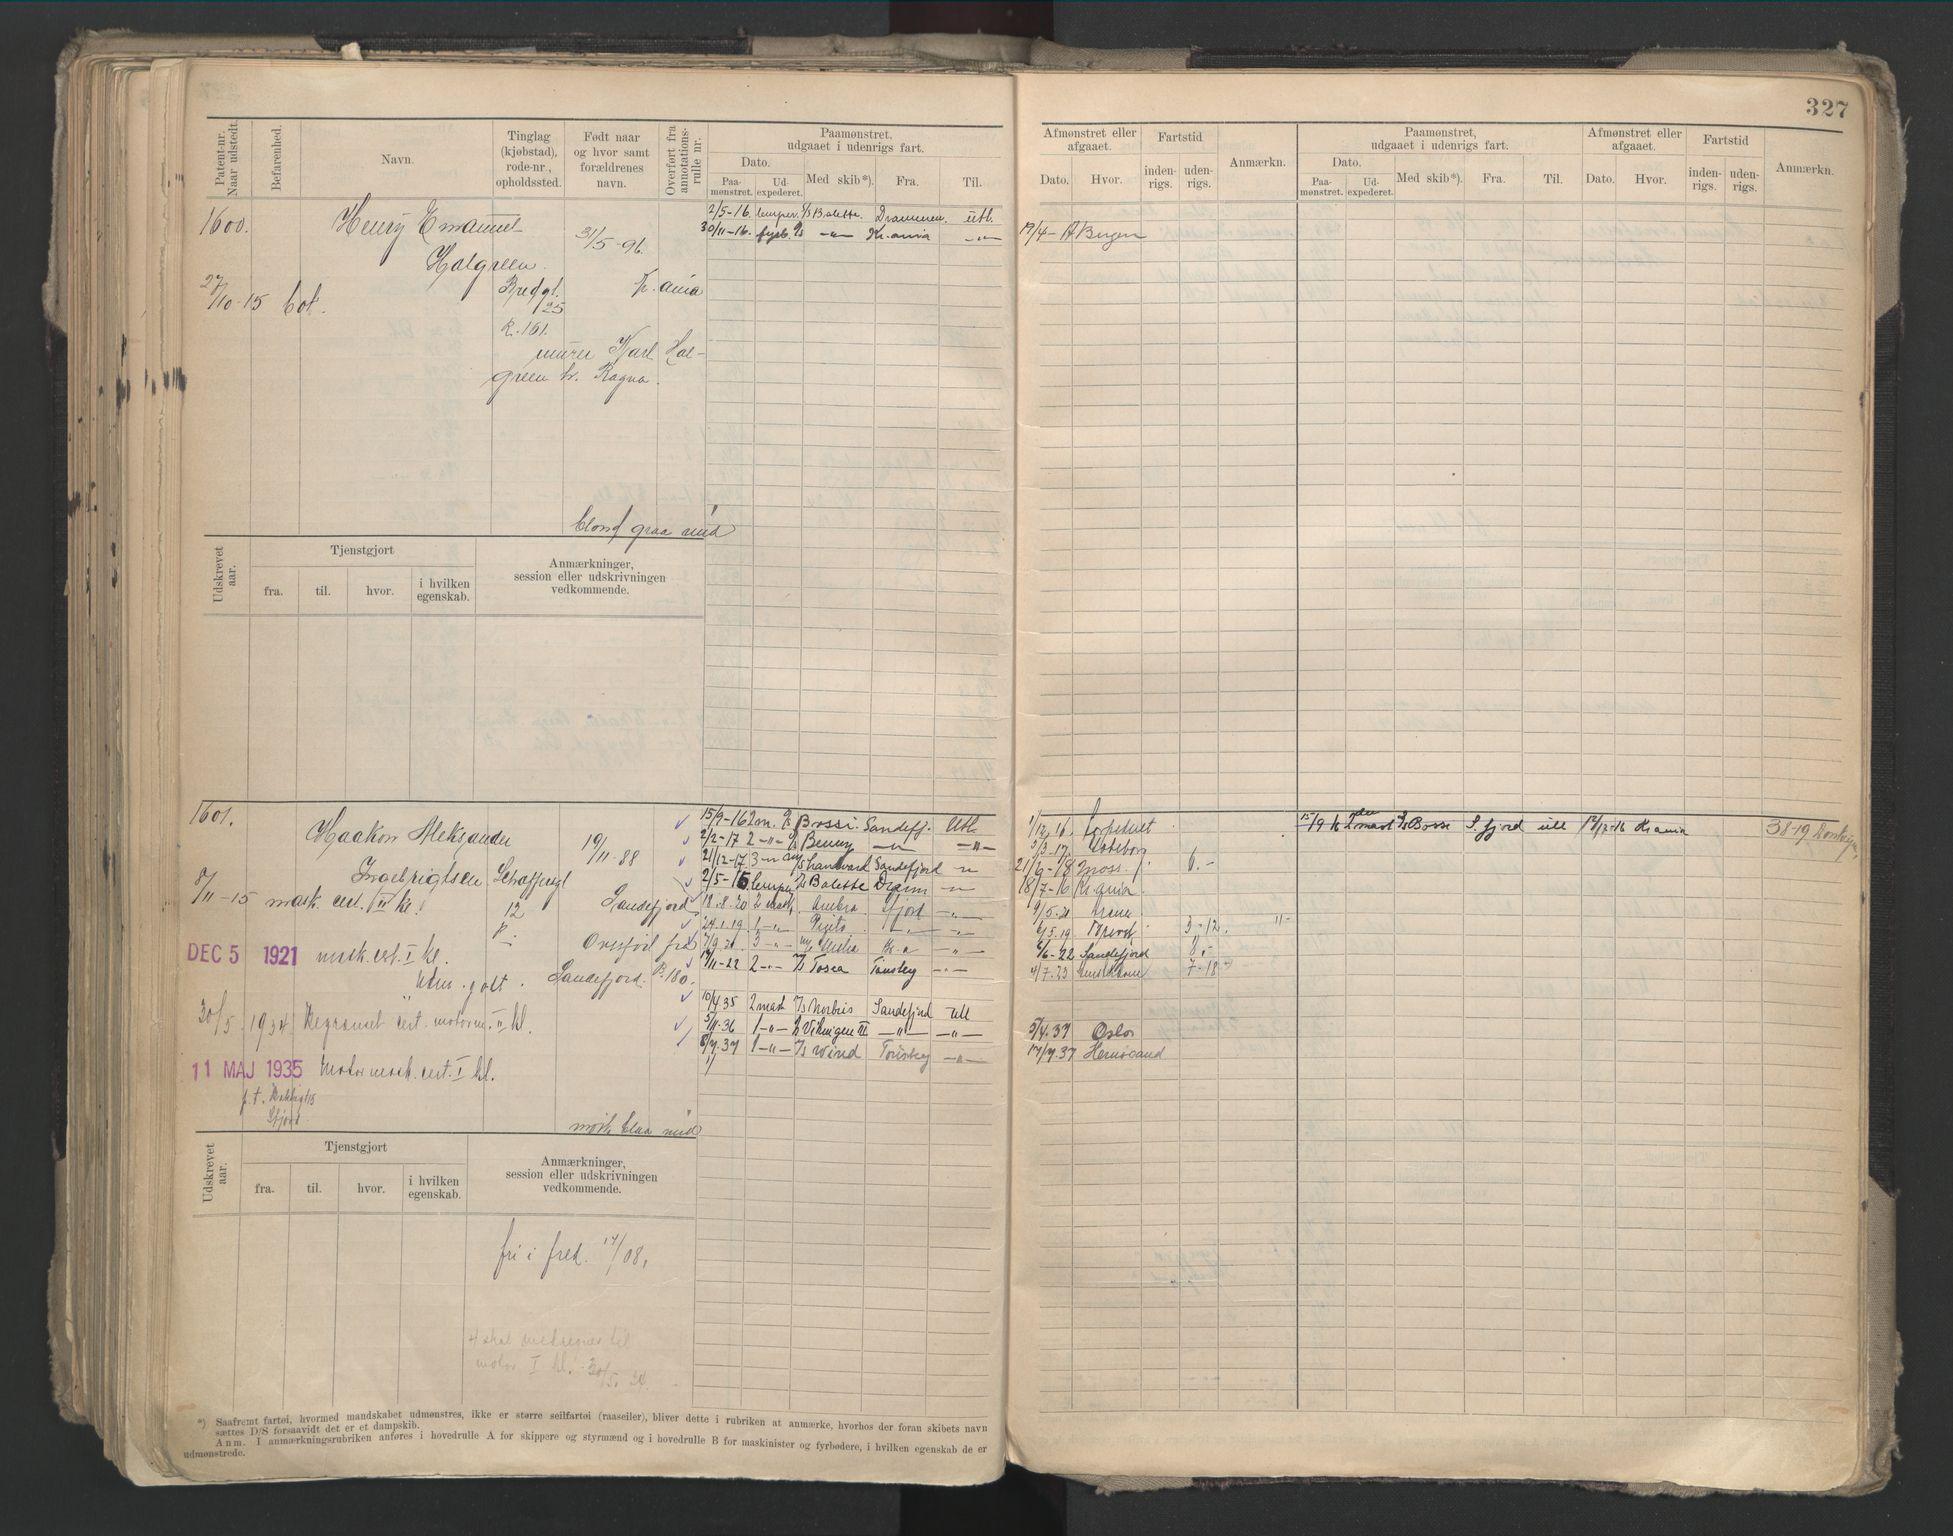 SAO, Oslo sjømannskontor, F/Fd/L0002: B-rulle, 1906-1916, s. 326b-327a